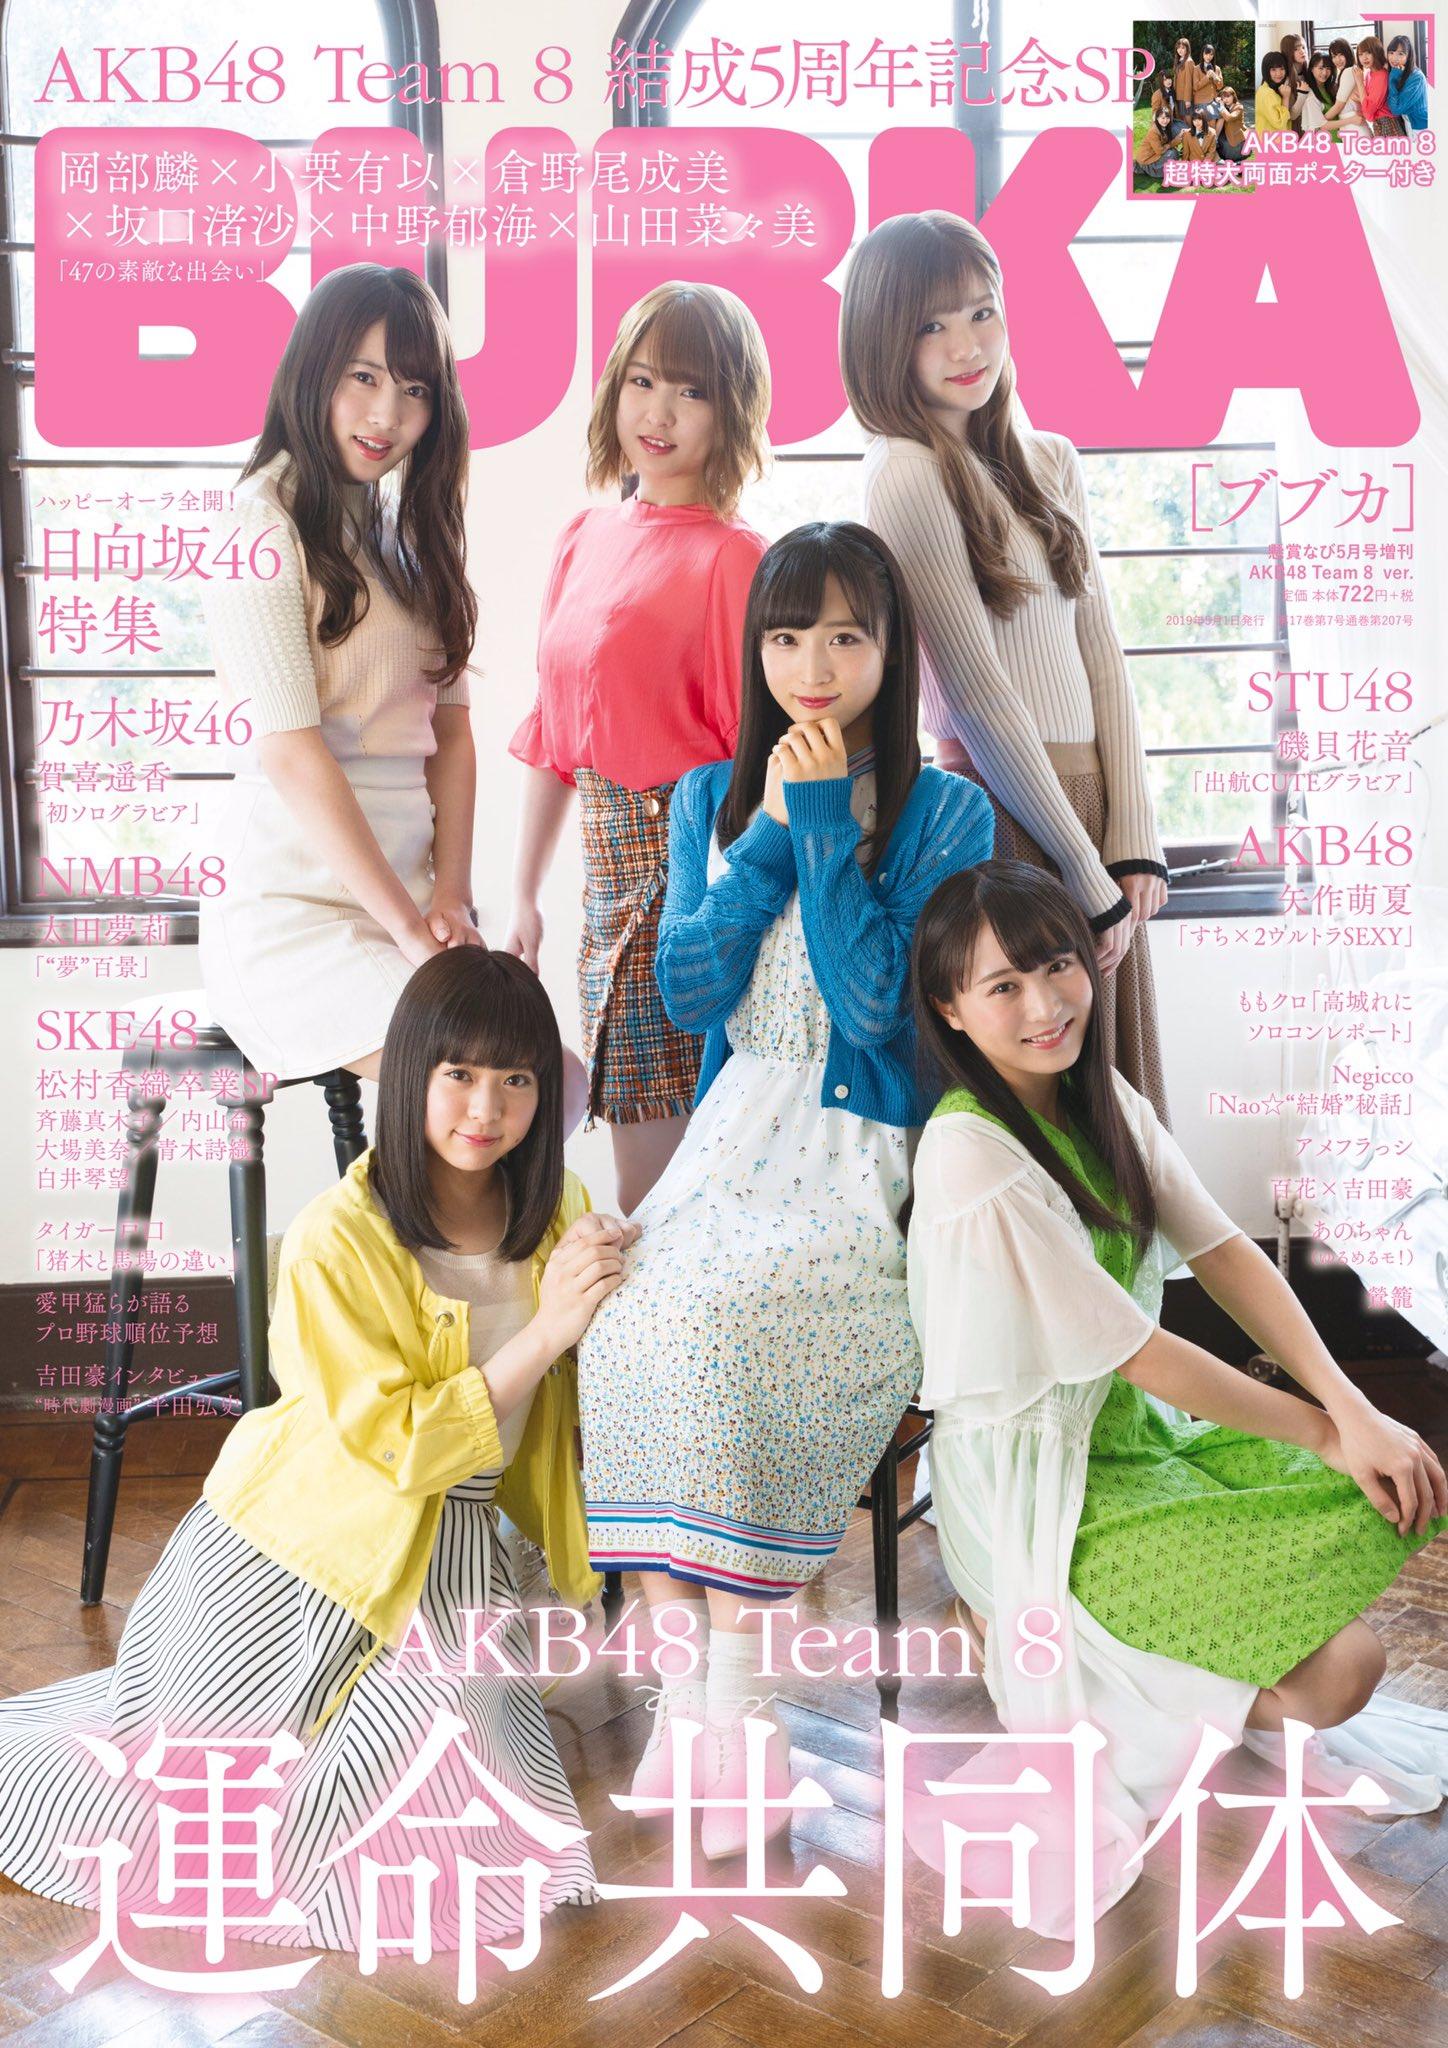 BUBKAの表紙にチーム8 キタ━━━━ヽ('∀`)ノ━━━━!!!!